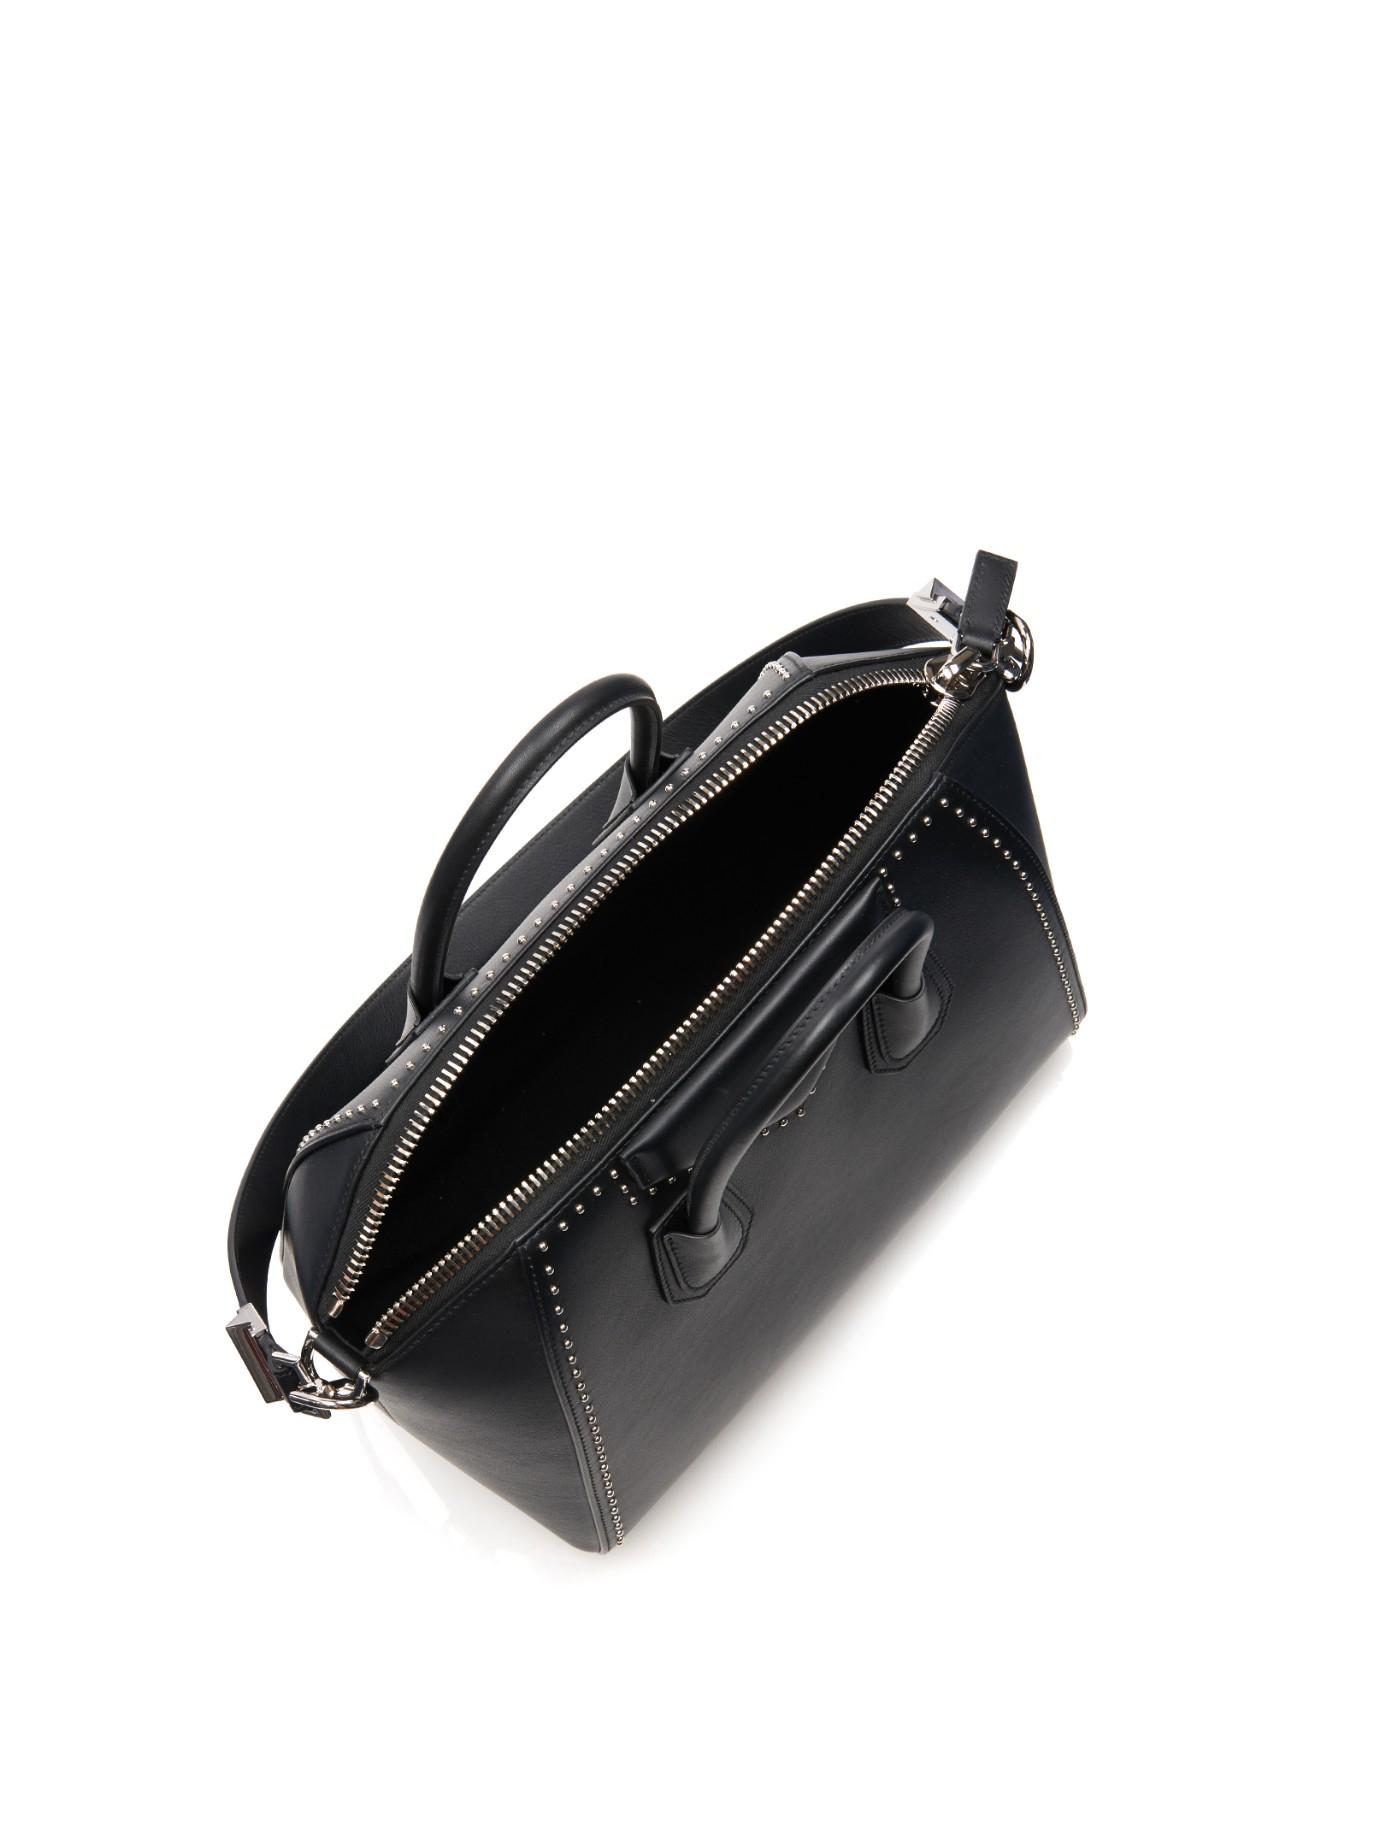 Lyst - Givenchy Antigona Medium Studded Leather Tote in Black 3e12b9ae83186